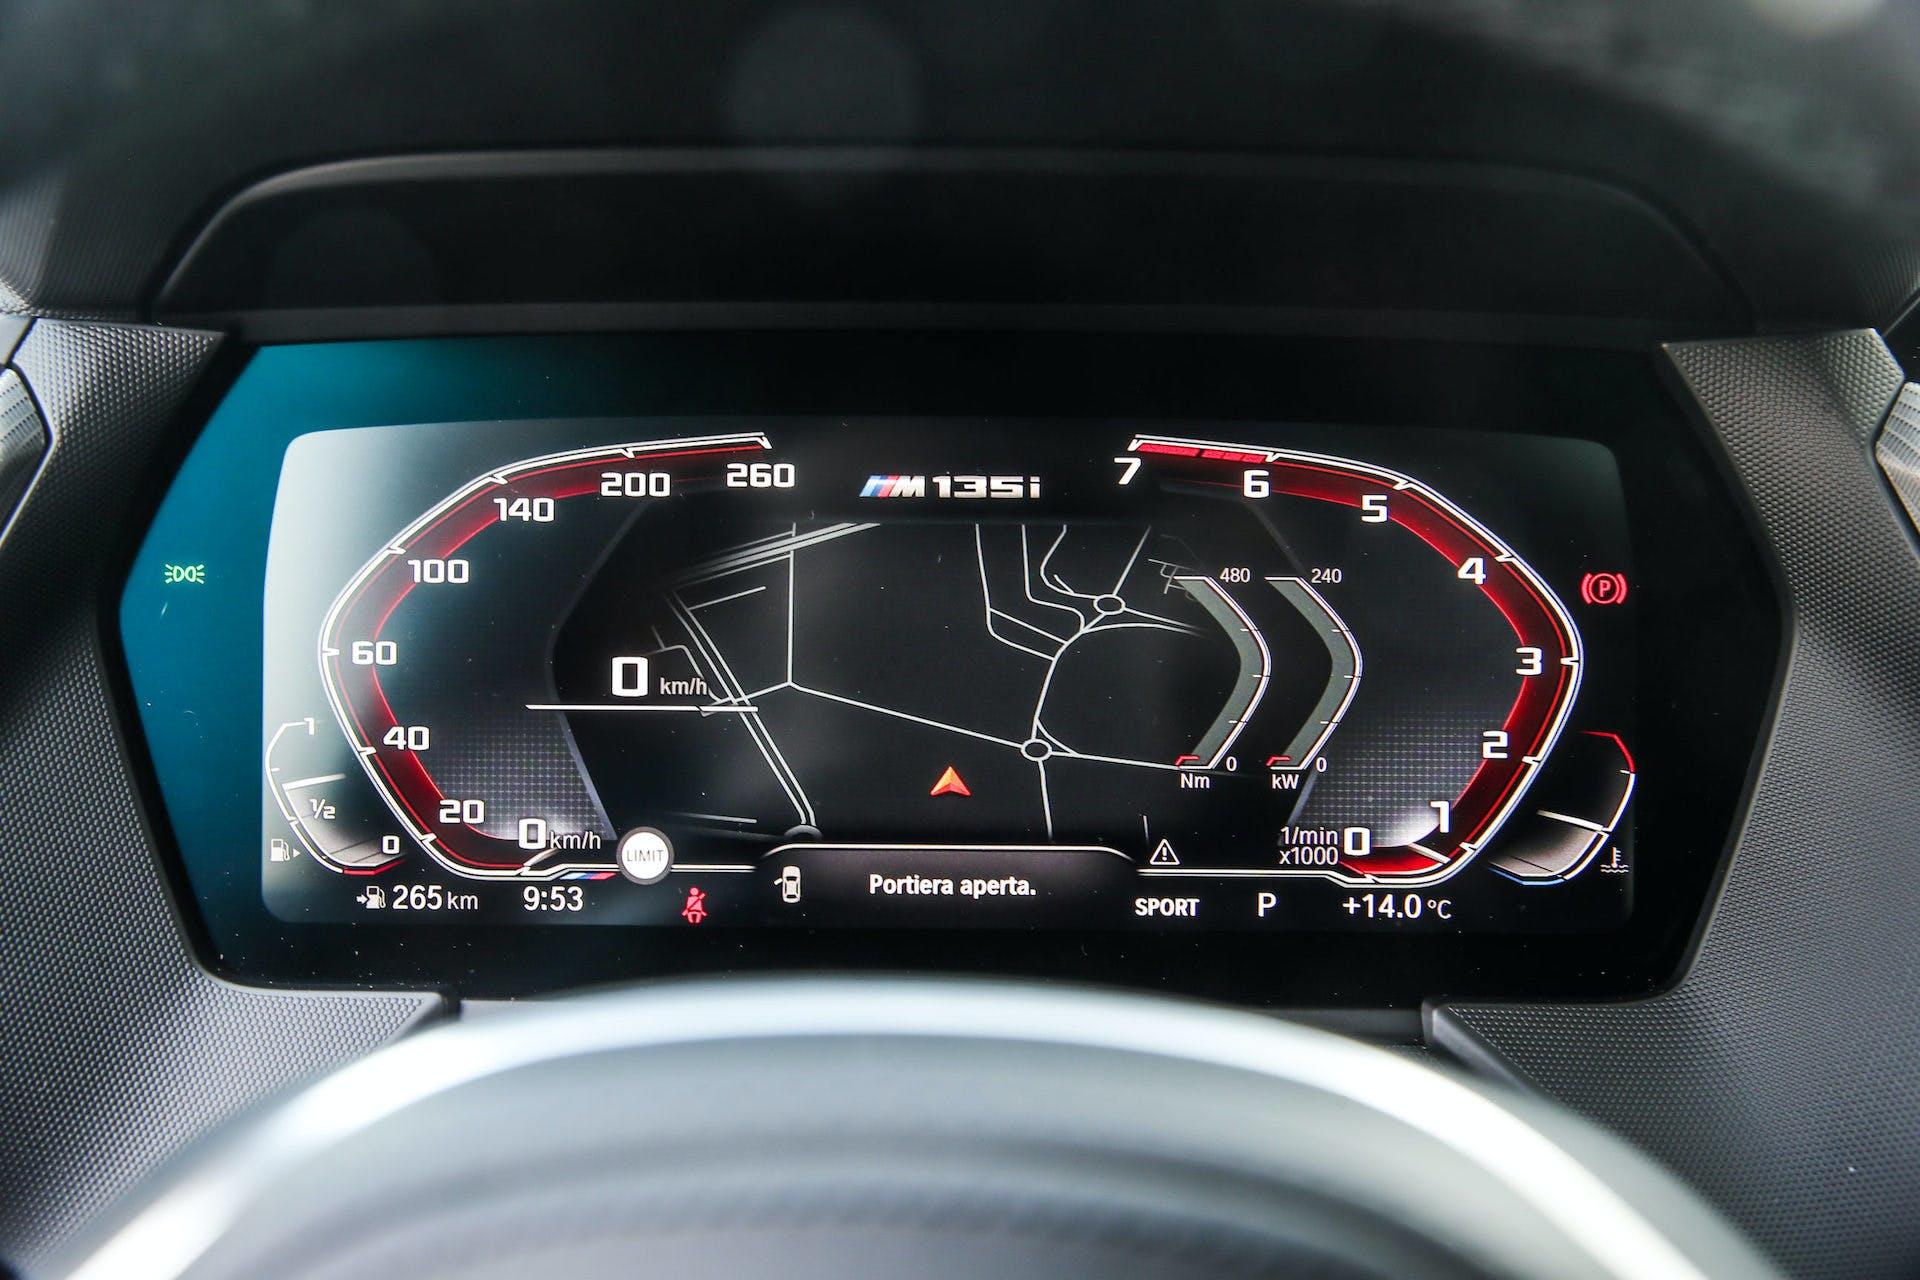 BMW M135i strumentazione digitale